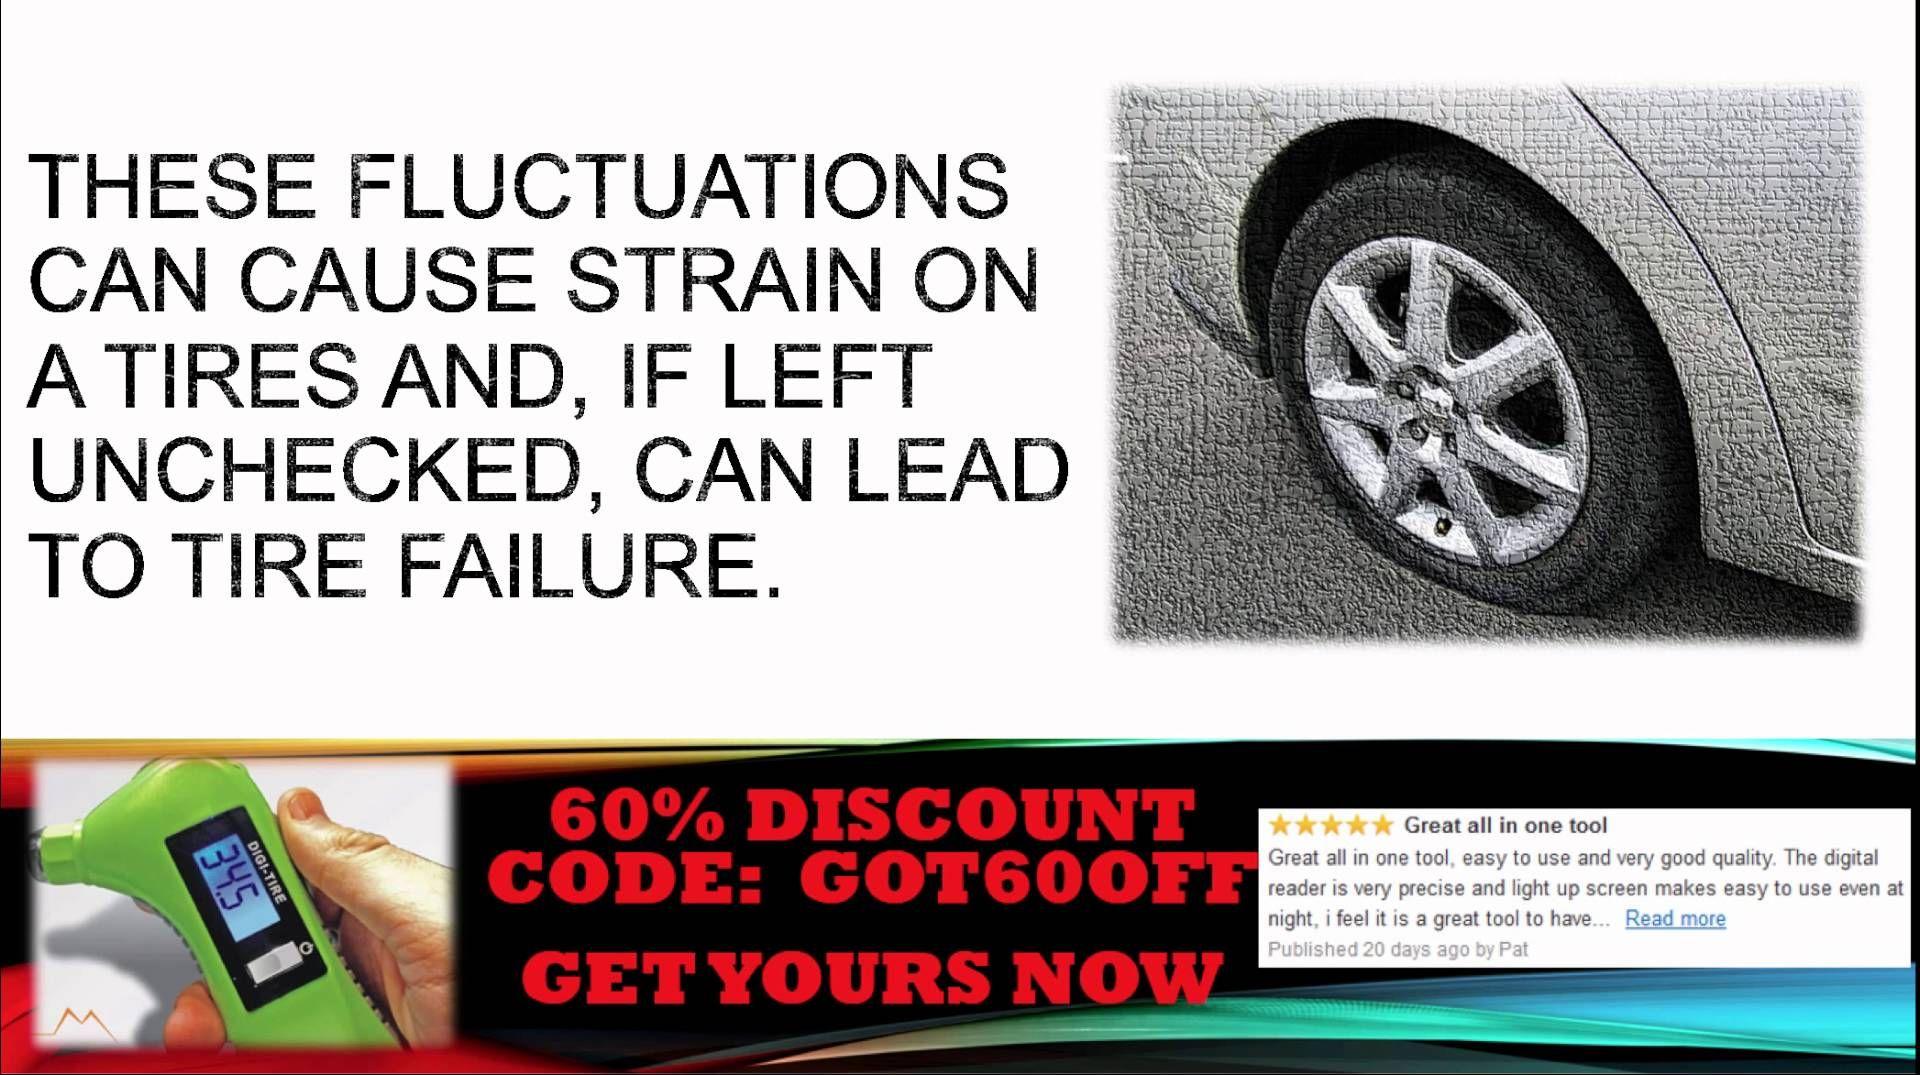 Https Www Youtube Com Watch V 9pkd3rbdrry Change Engine Oil Engine Oil Check Tire Rotation Oil Change Oil Change Car Maintenance Maintenance